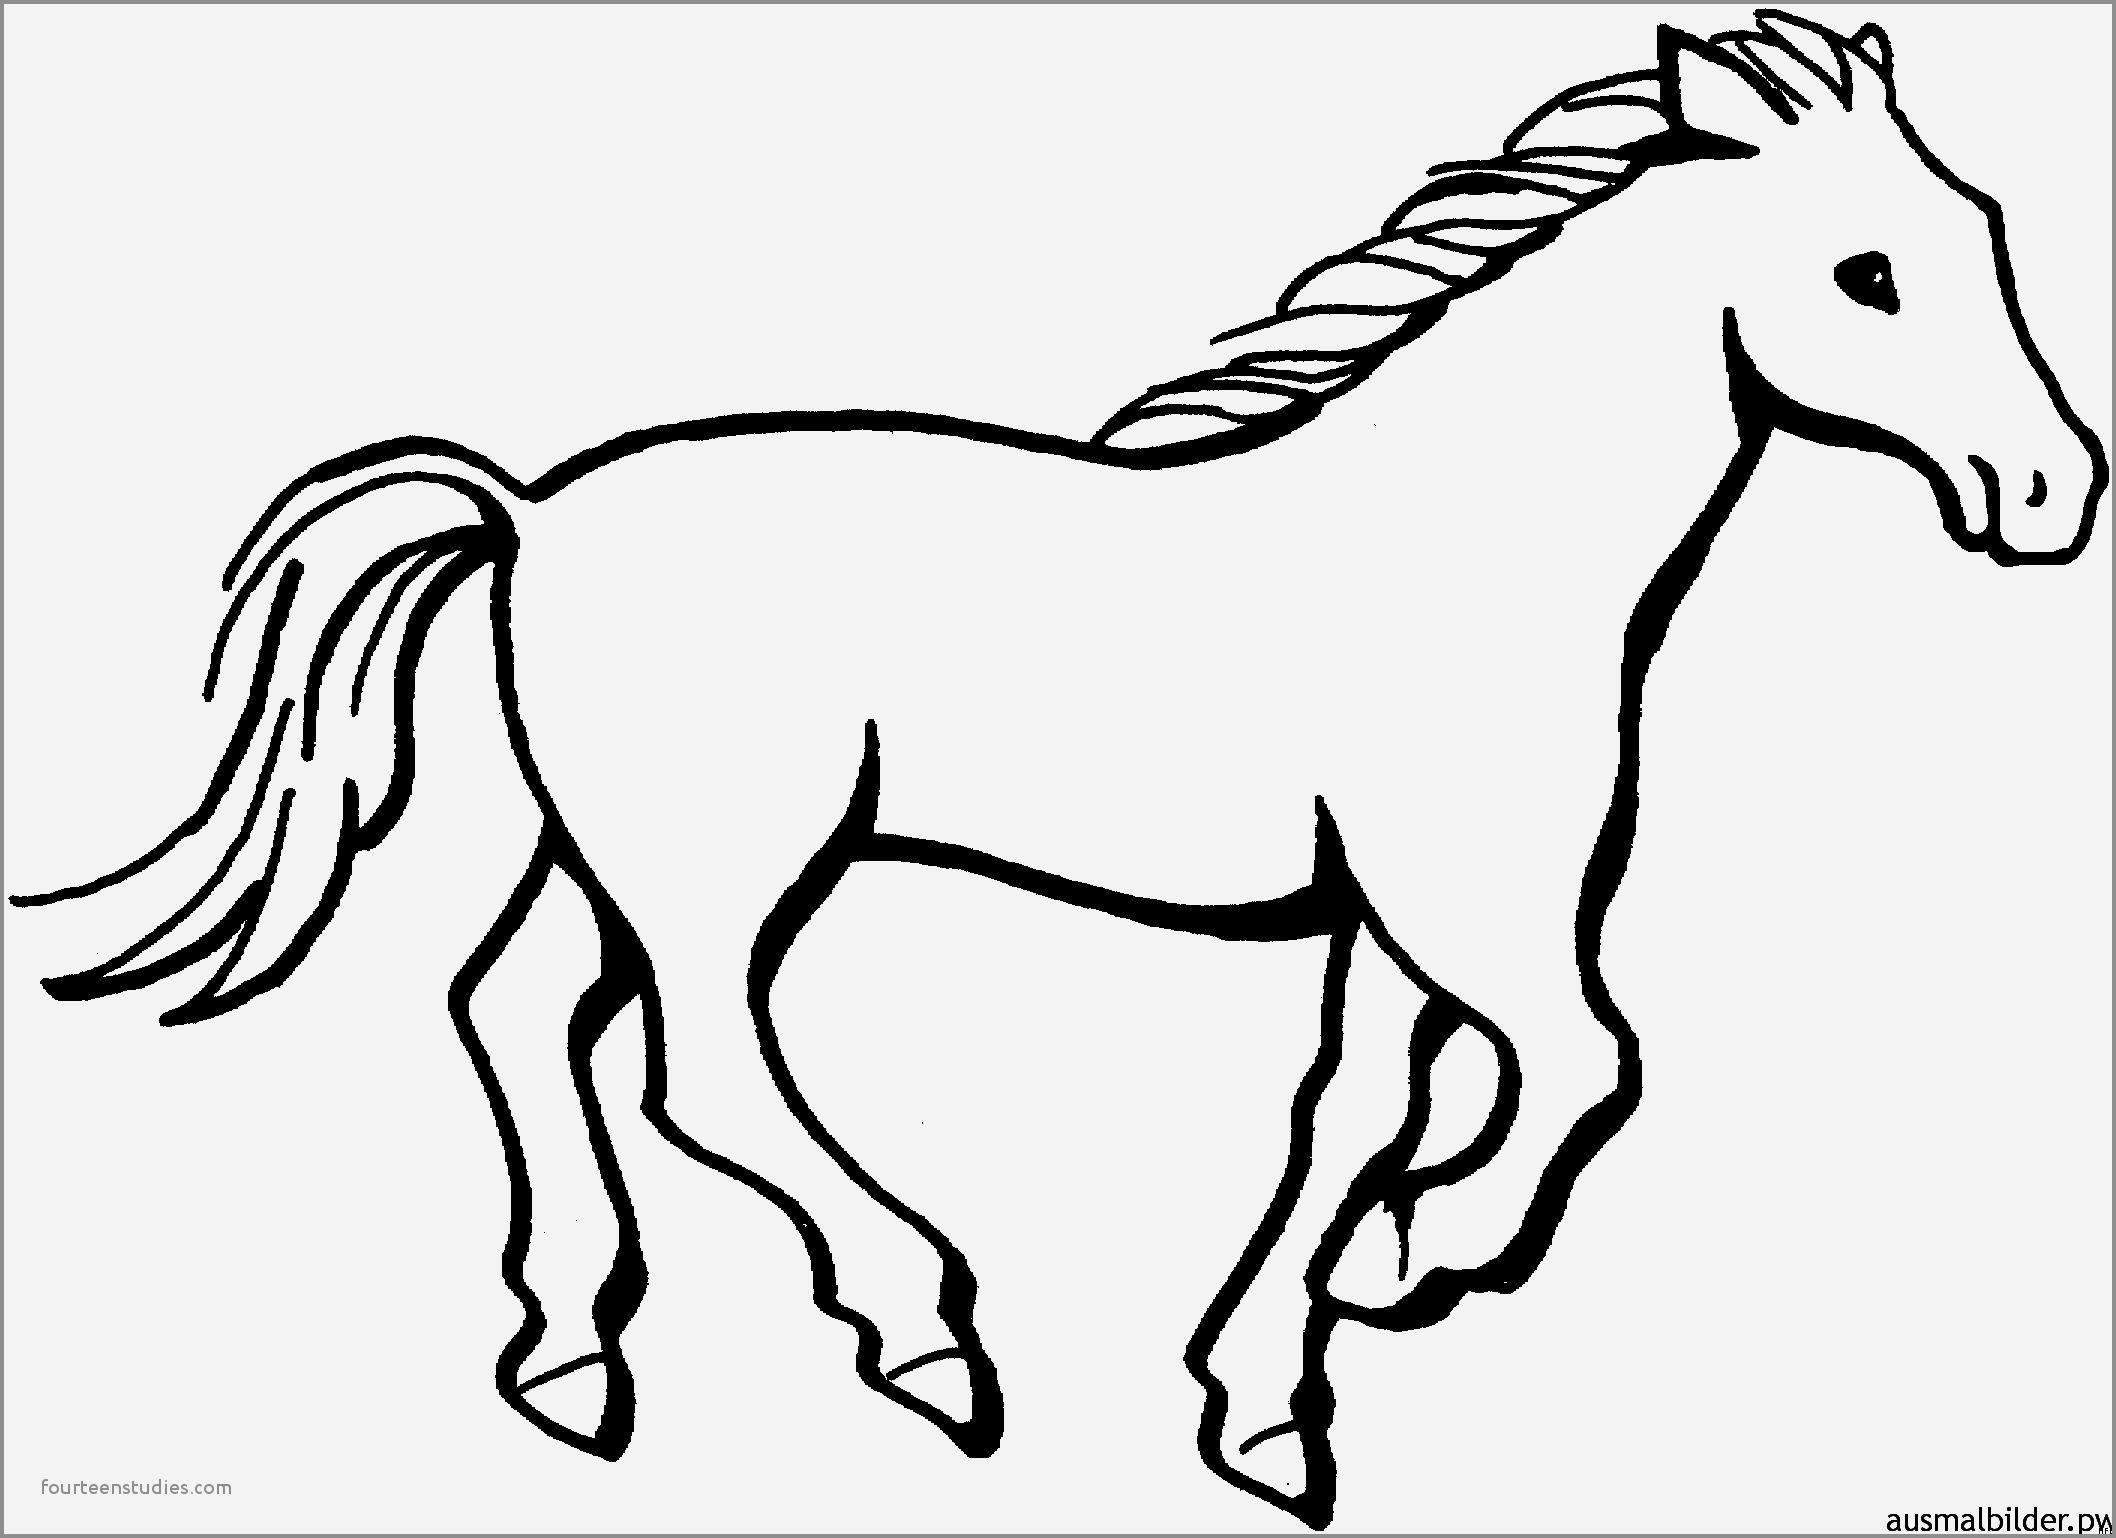 Pferde Ausmalbilder #ausmalbilder #pferde | Ausmalbilder in Pferde Bilder Zum Ausmalen Und Ausdrucken